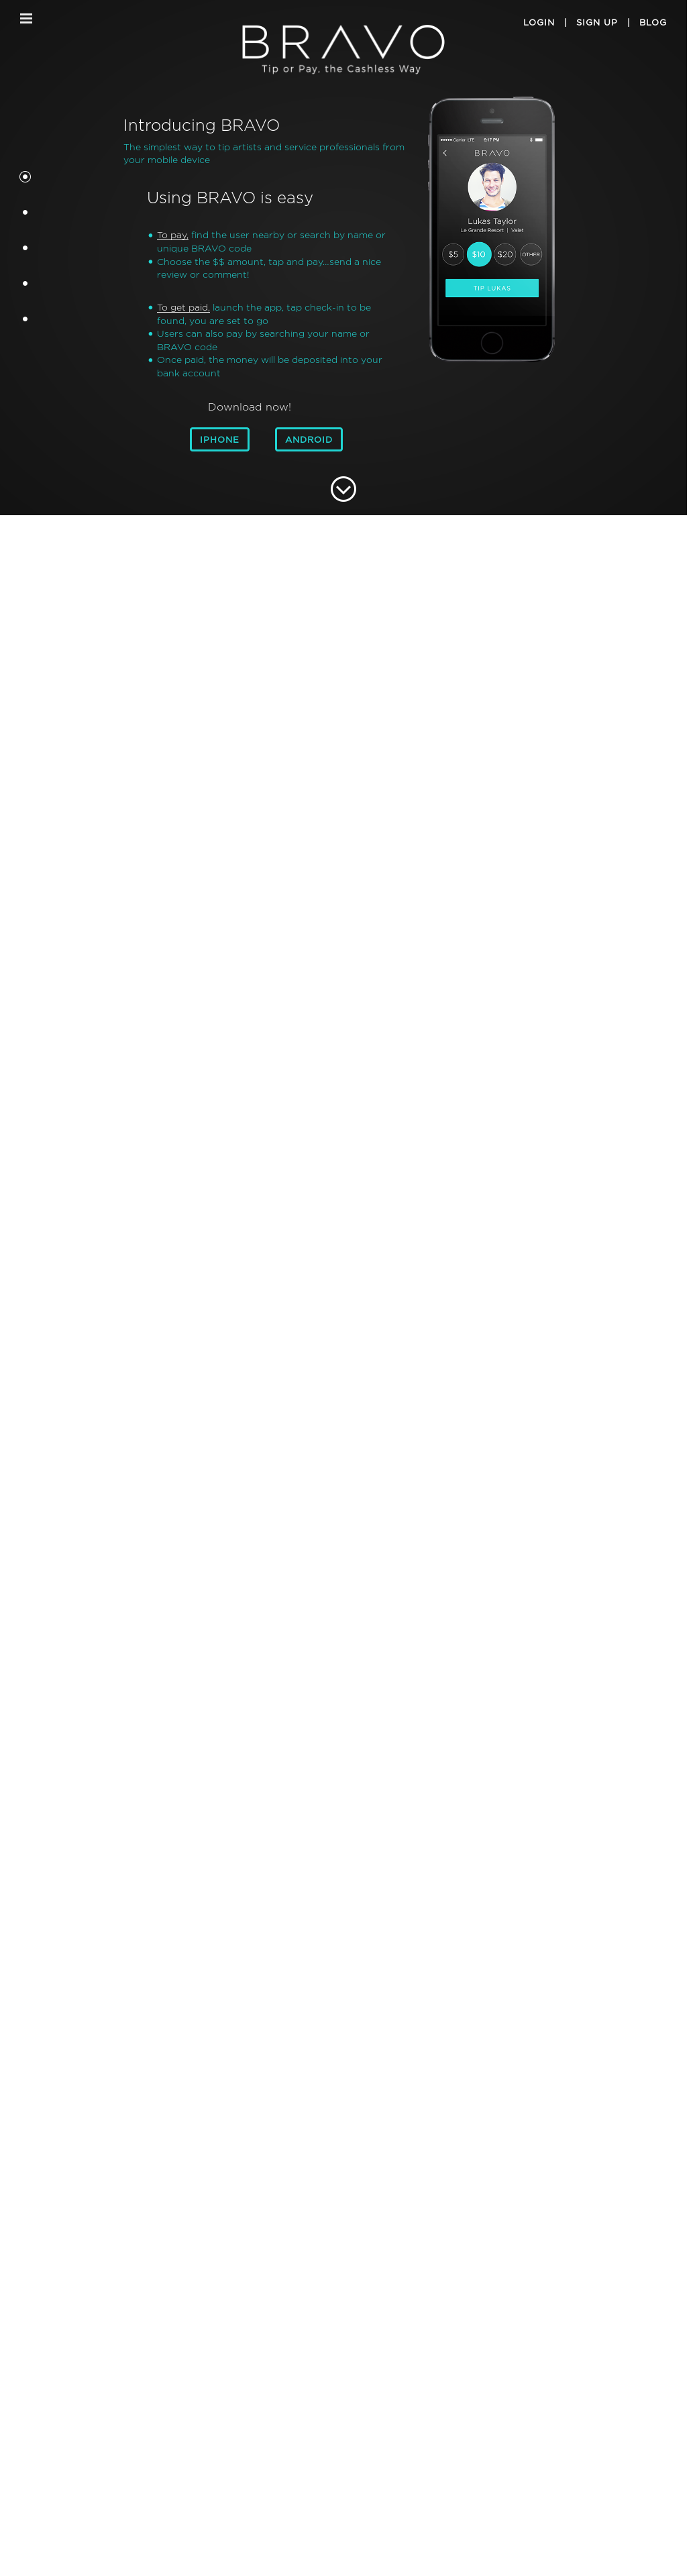 Trybravo Competitors, Revenue and Employees - Owler Company